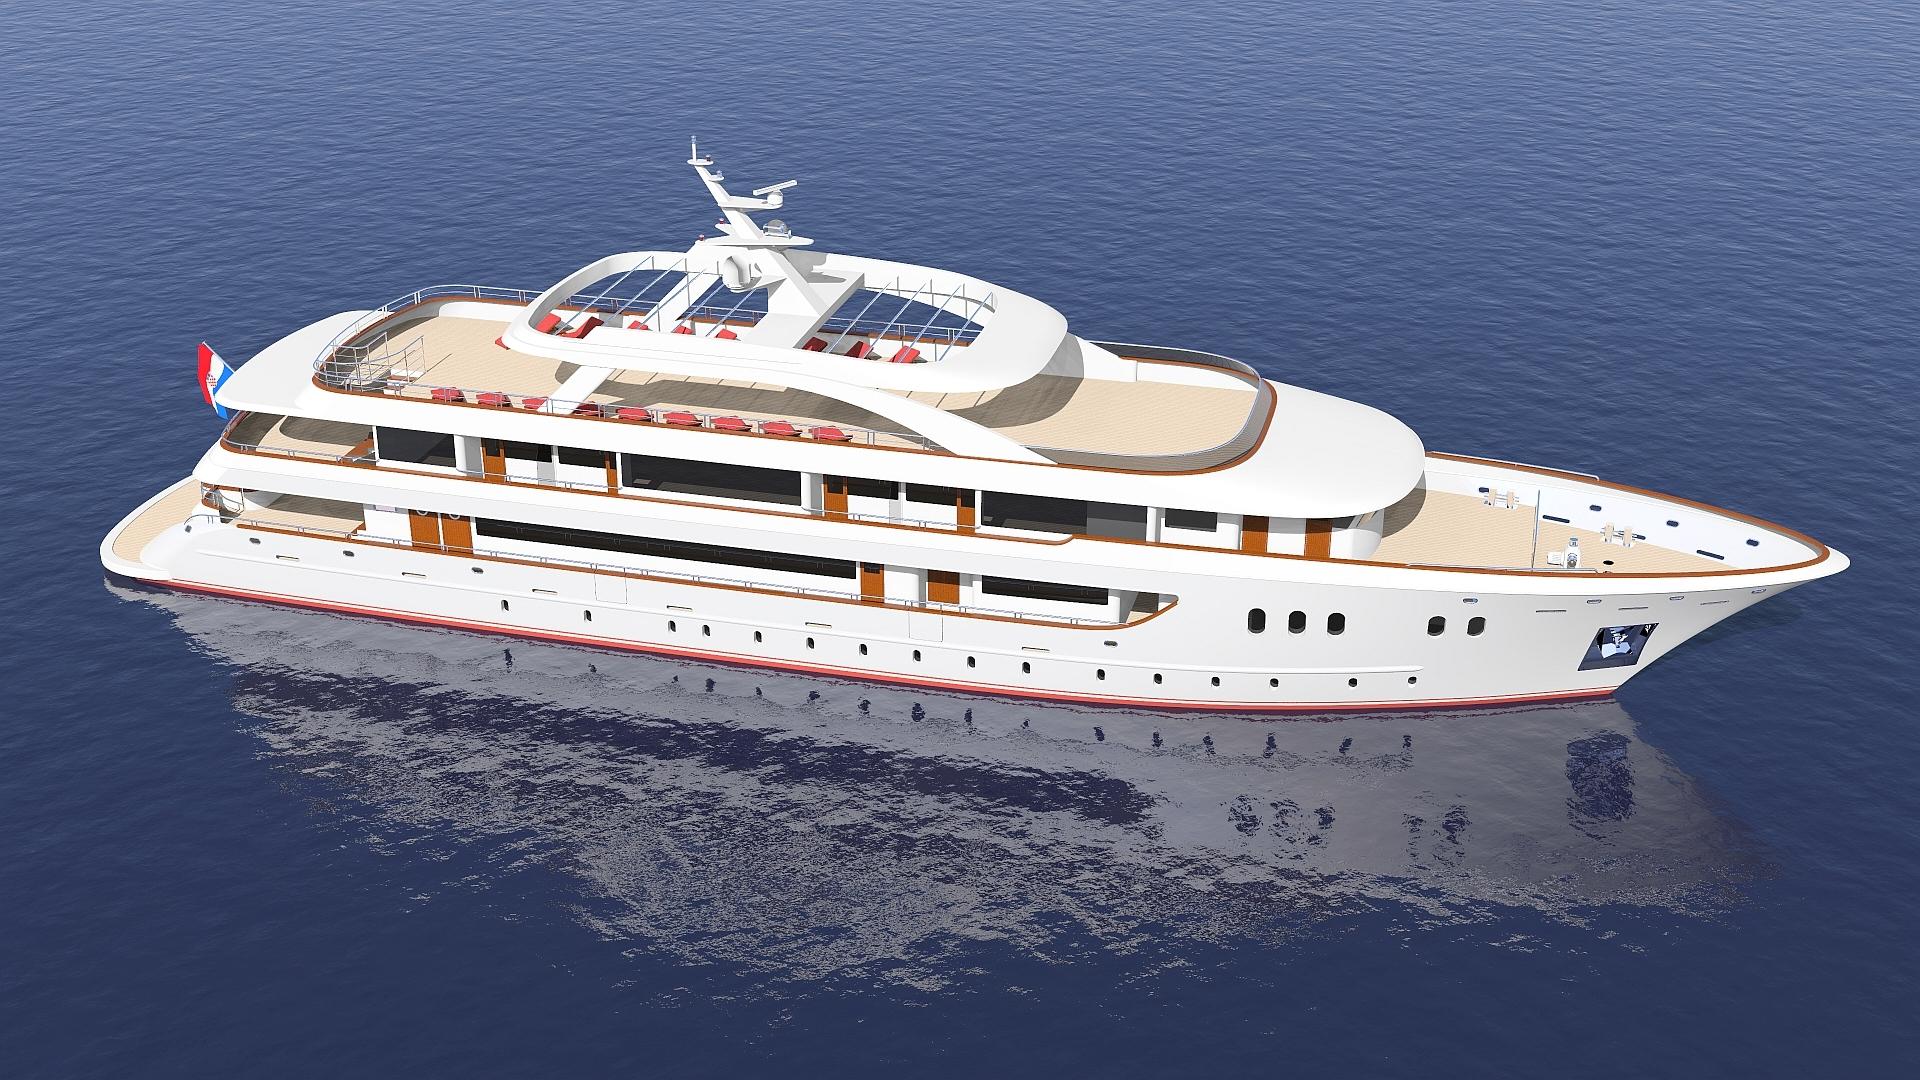 Aurelia Croatia Luxury Cruise Ship The Small Cruise Ship Collection